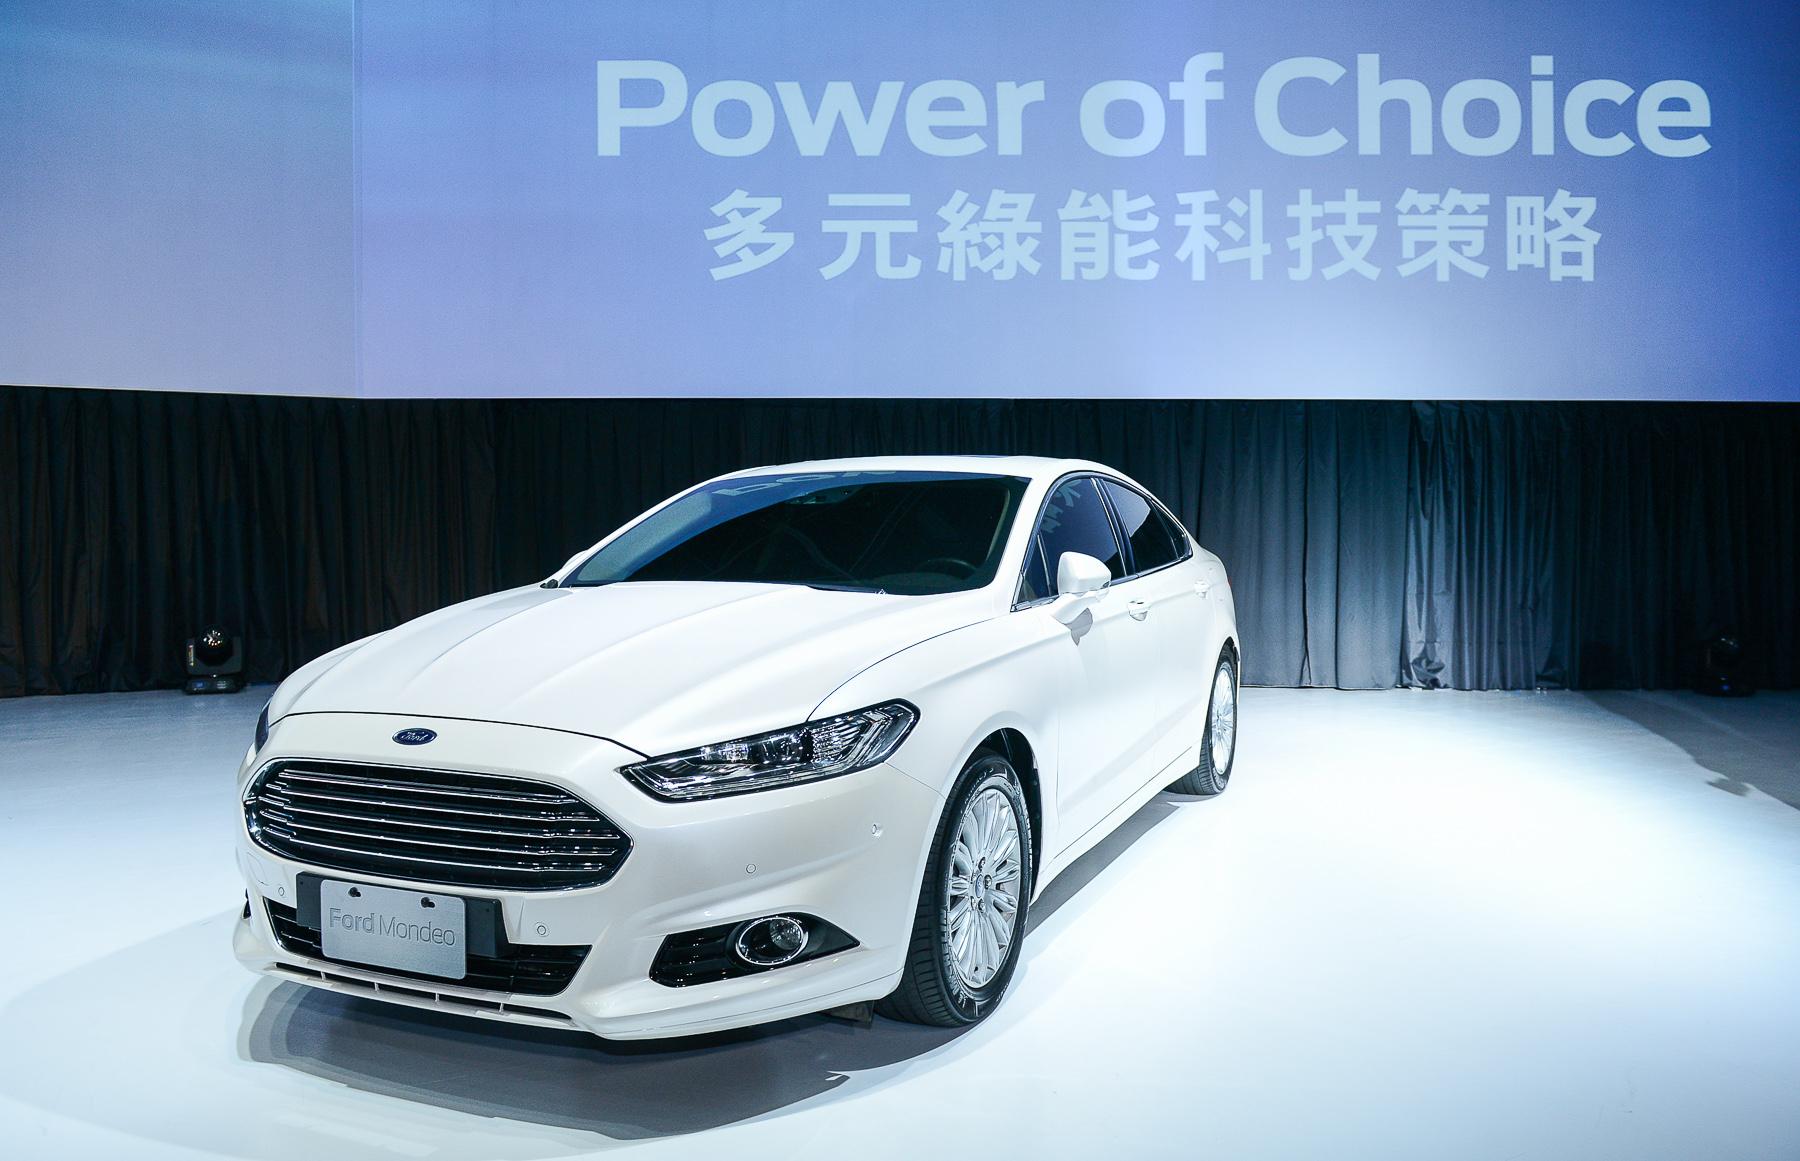 Ford產品涵蓋率再擴展 《Go Further品牌高峰會》四大產品全新亮相